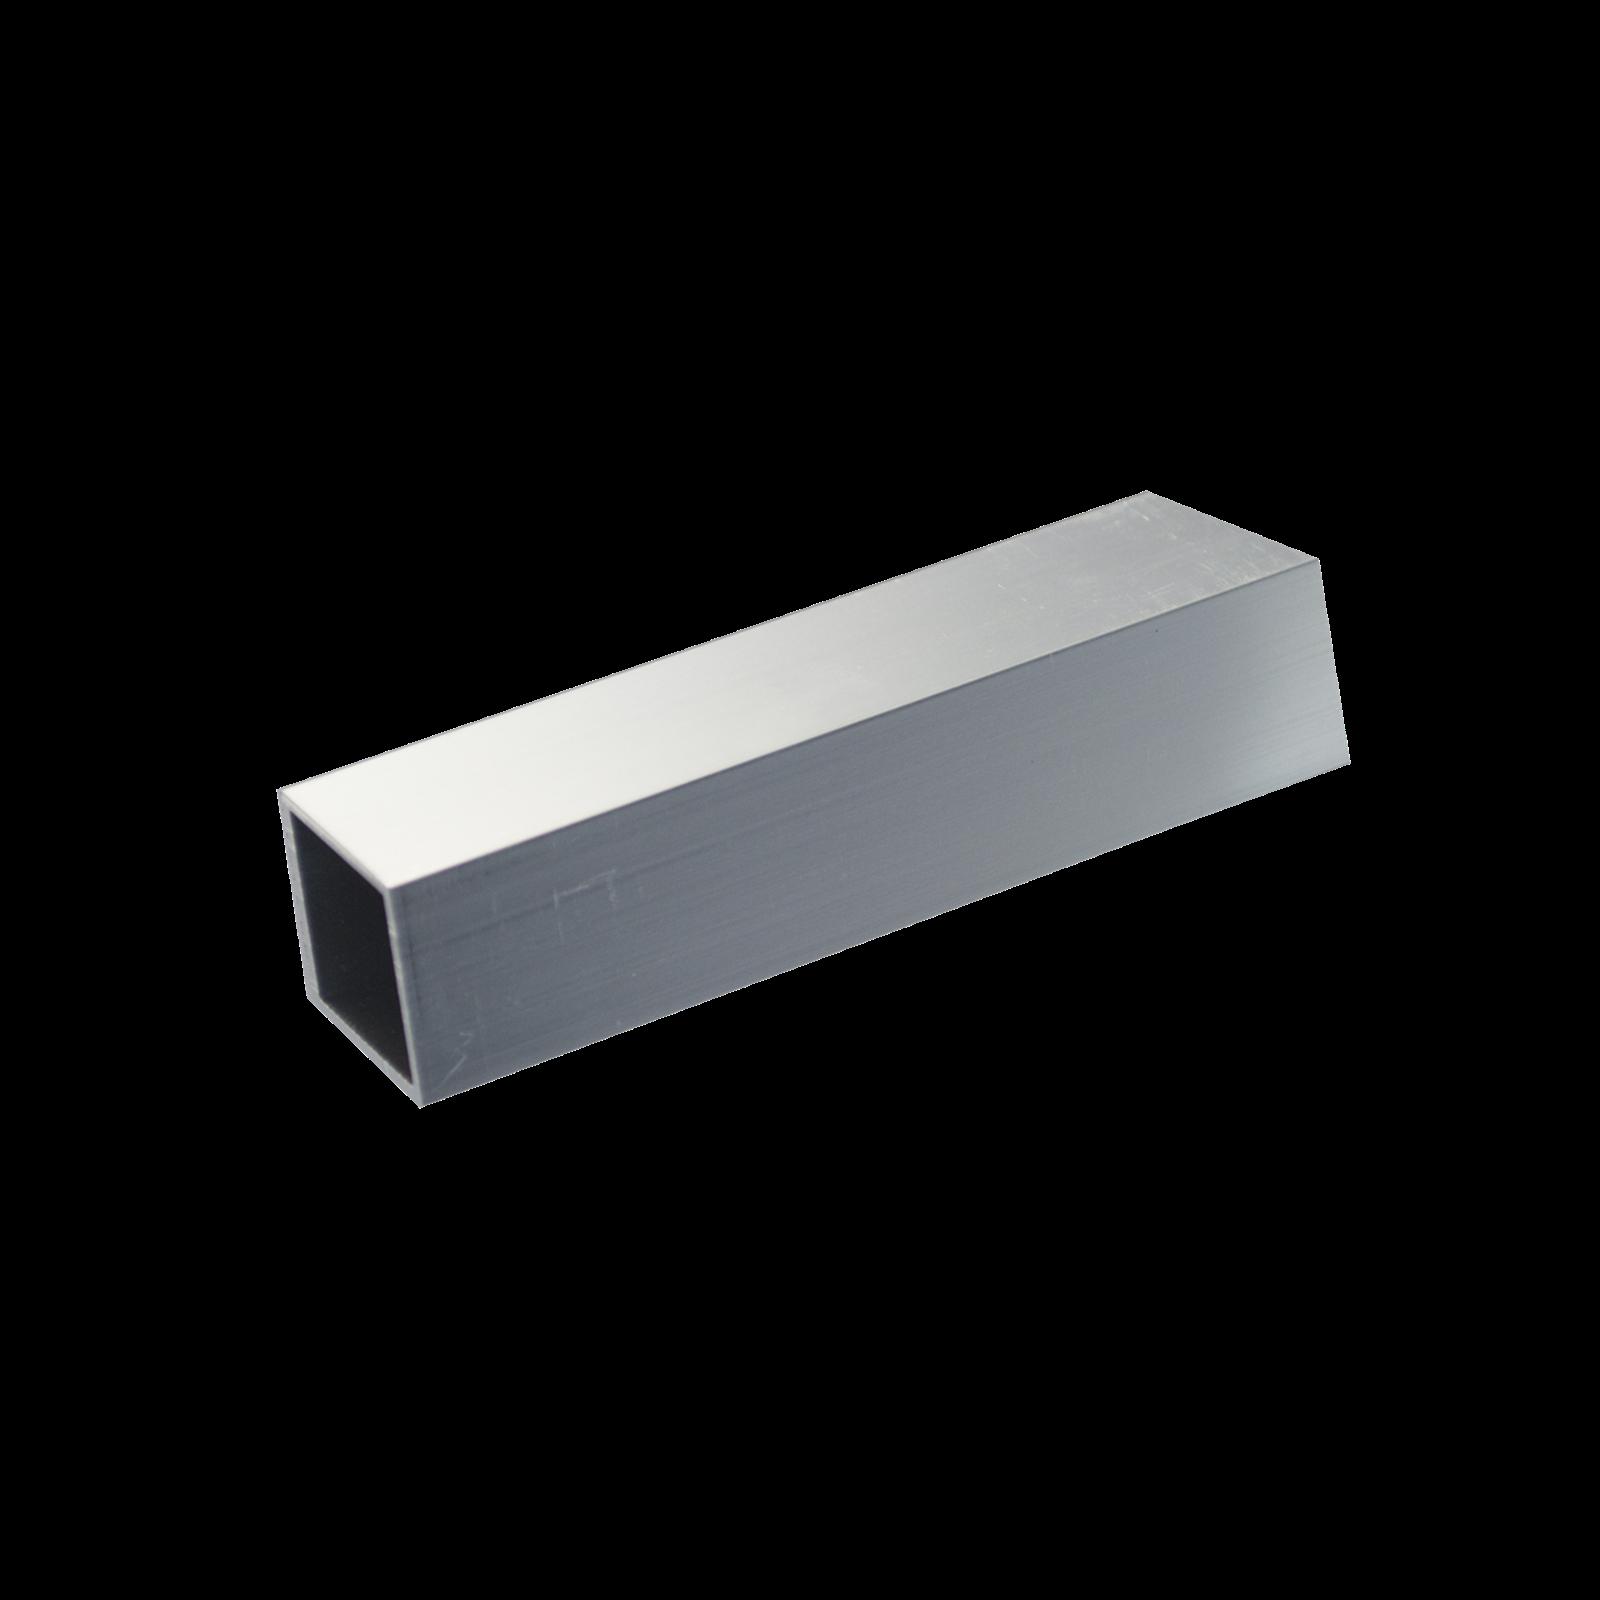 Metal Mate 70 x 70 x 1.85mm x 3m Aluminium Square Tube